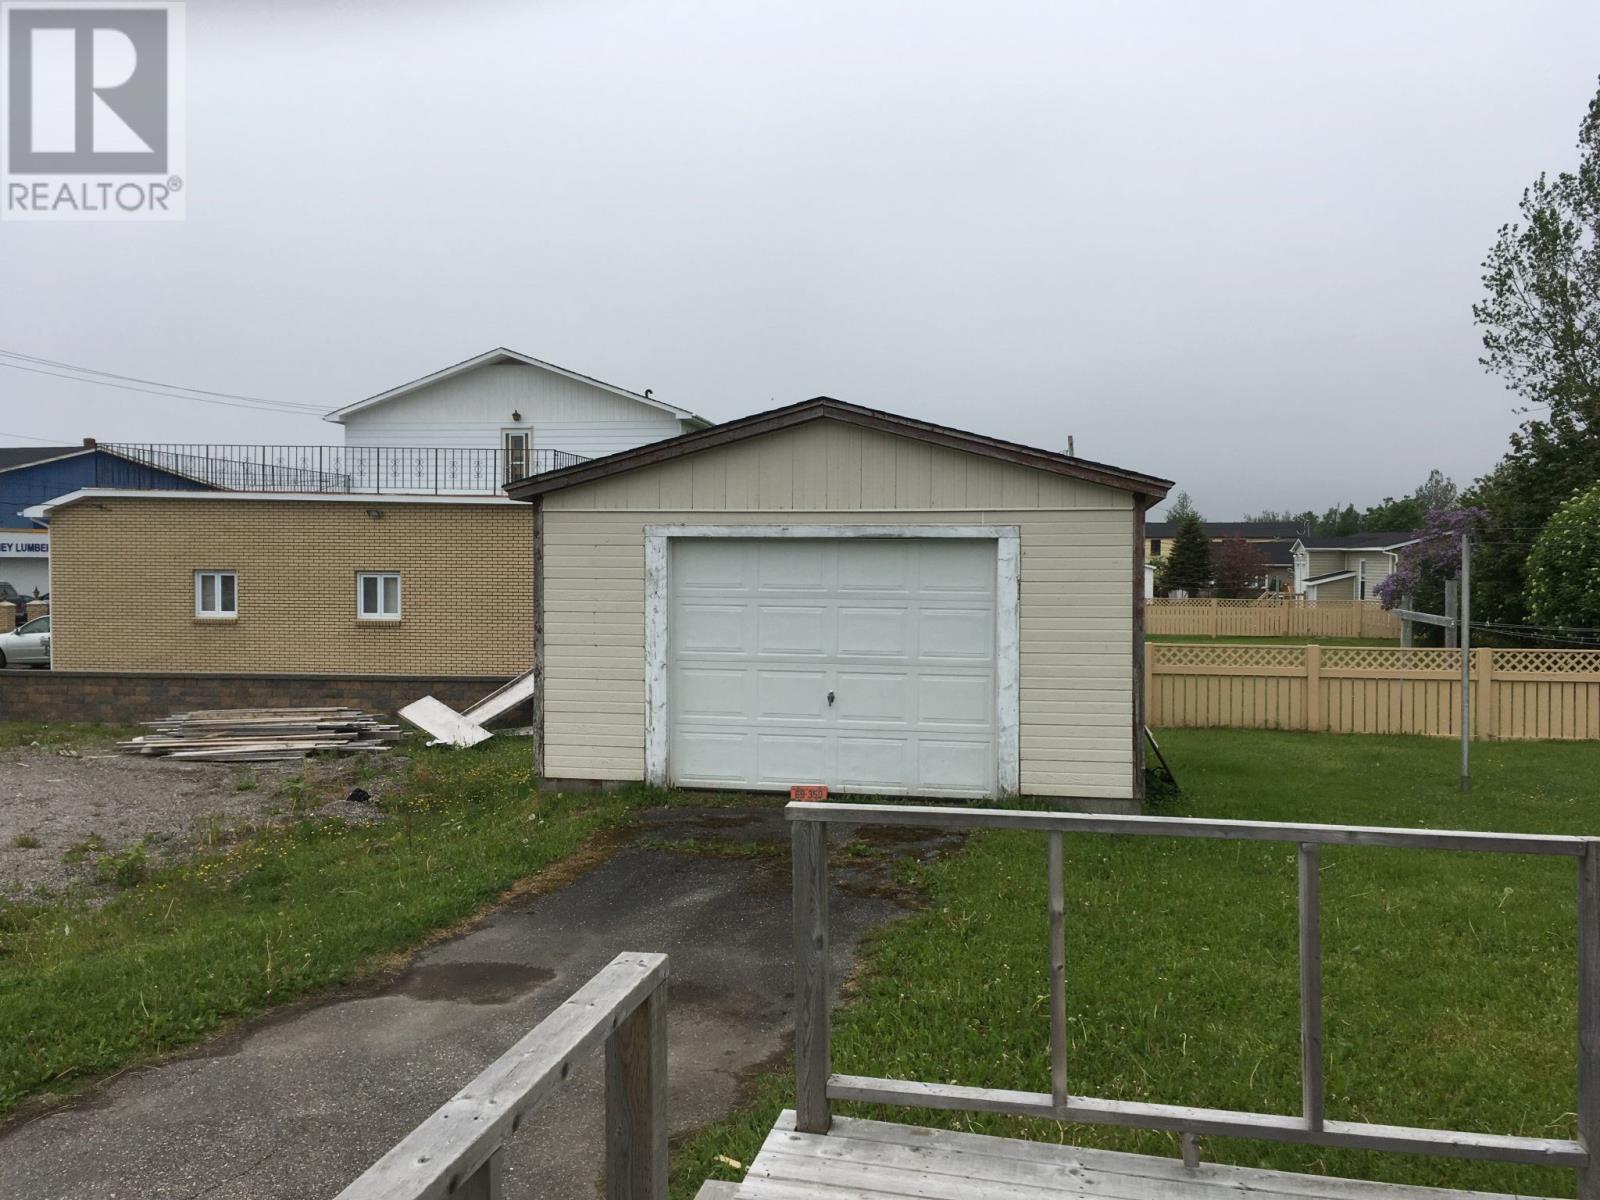 121 Queen Street, Stephenville, Newfoundland & Labrador  A2N 2N6 - Photo 9 - 1158723